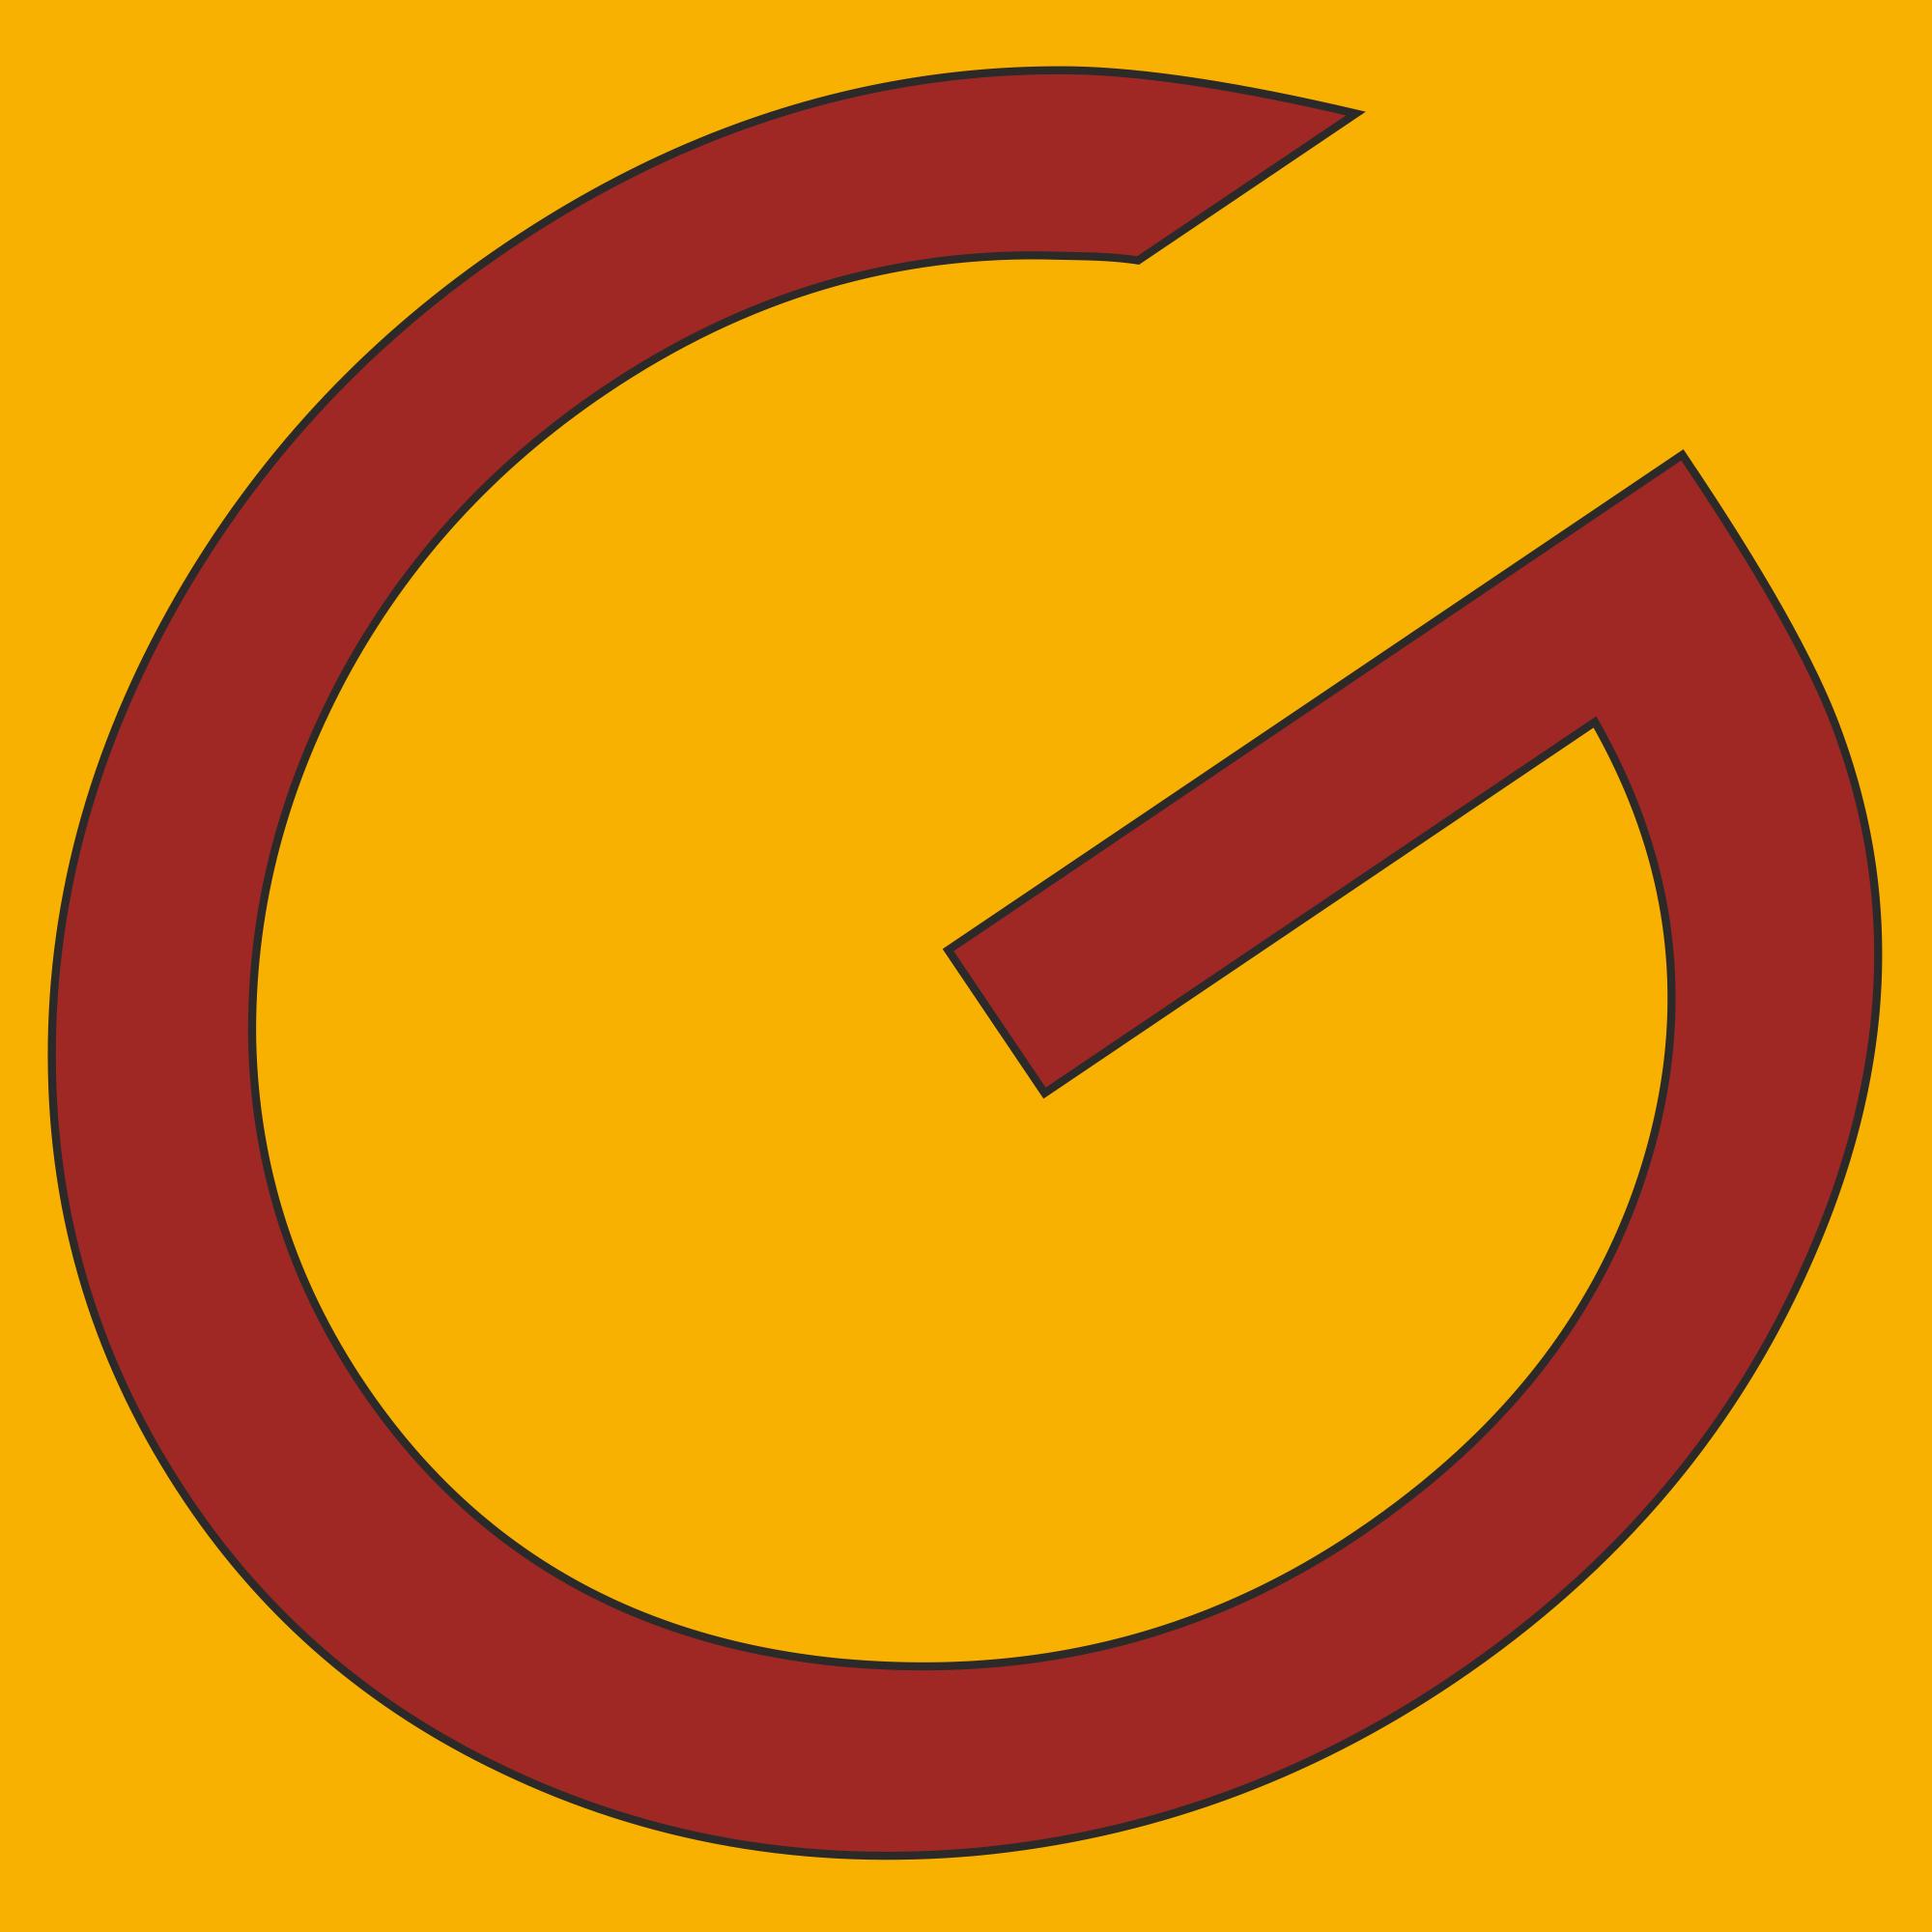 Baños, Sanitarios, Ceramicos, Griferia, Corralon | Guanzetti S.A.